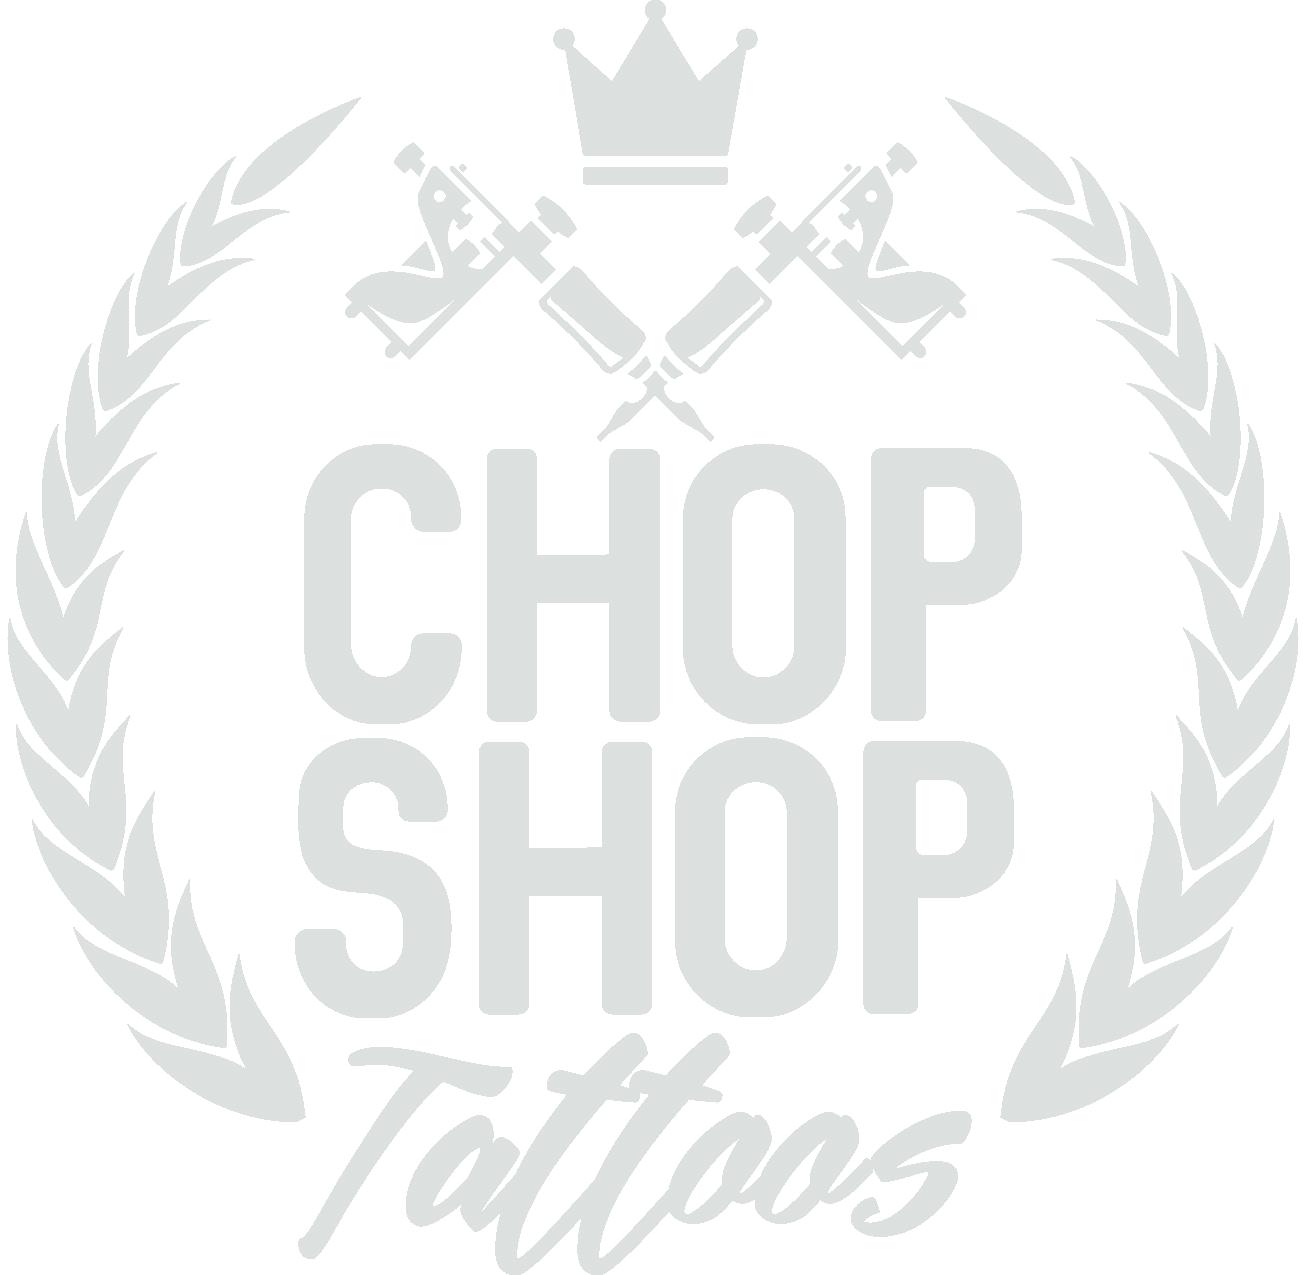 Chop Shop Tattoos.